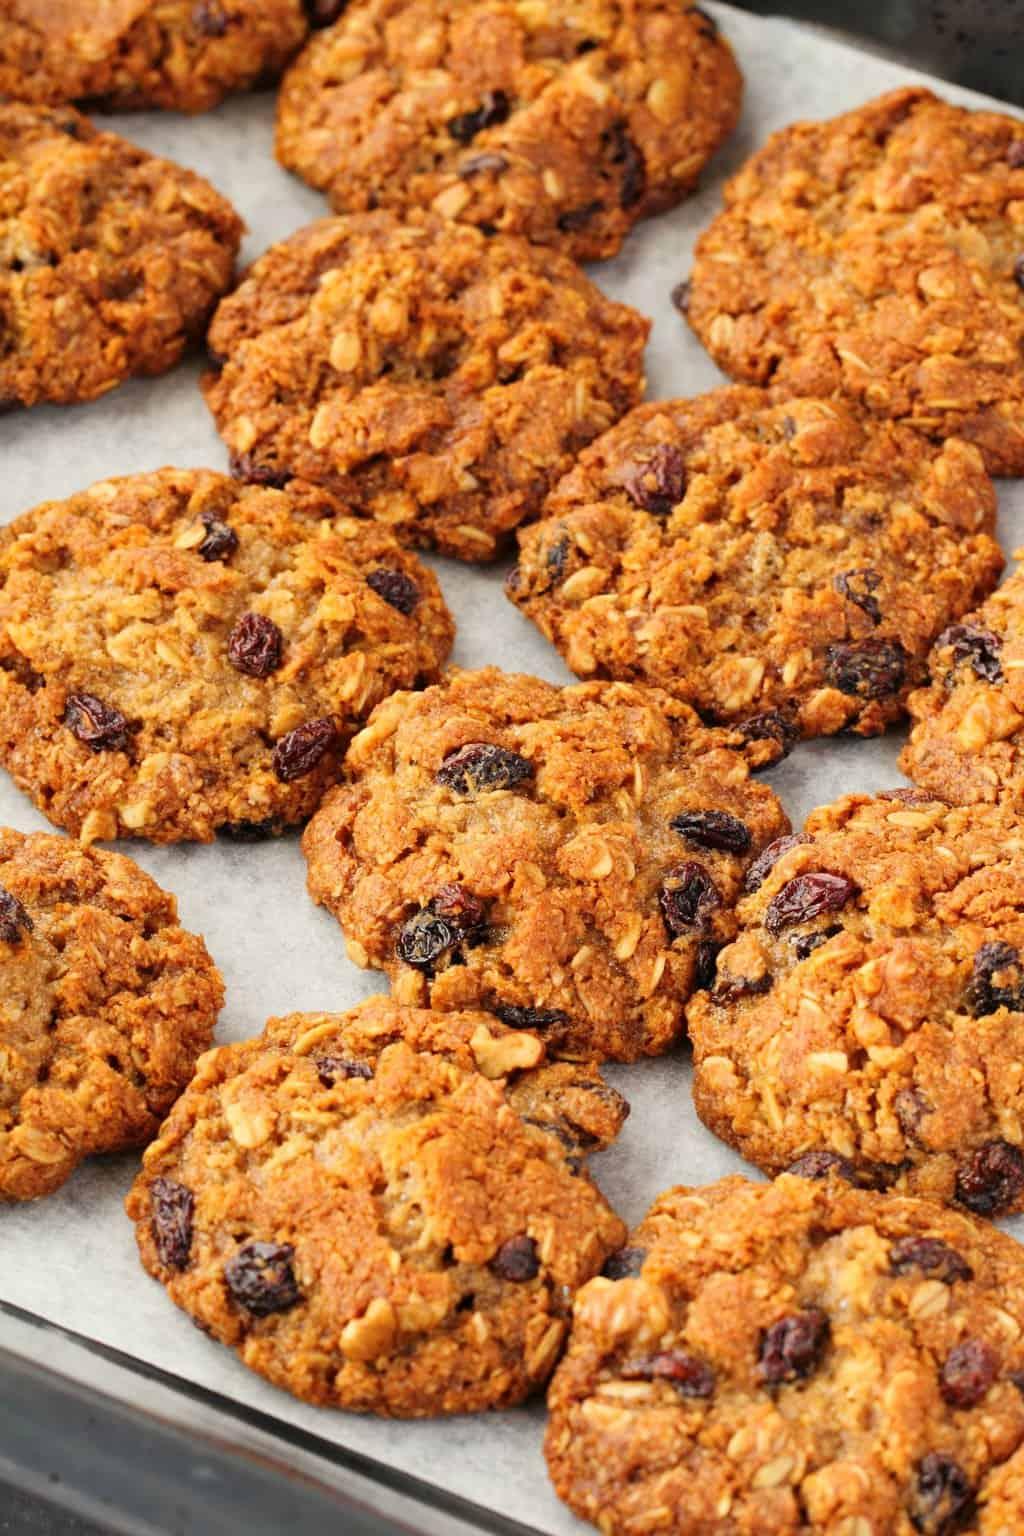 Freshly baked vegan oatmeal raisin cookies on a baking tray.